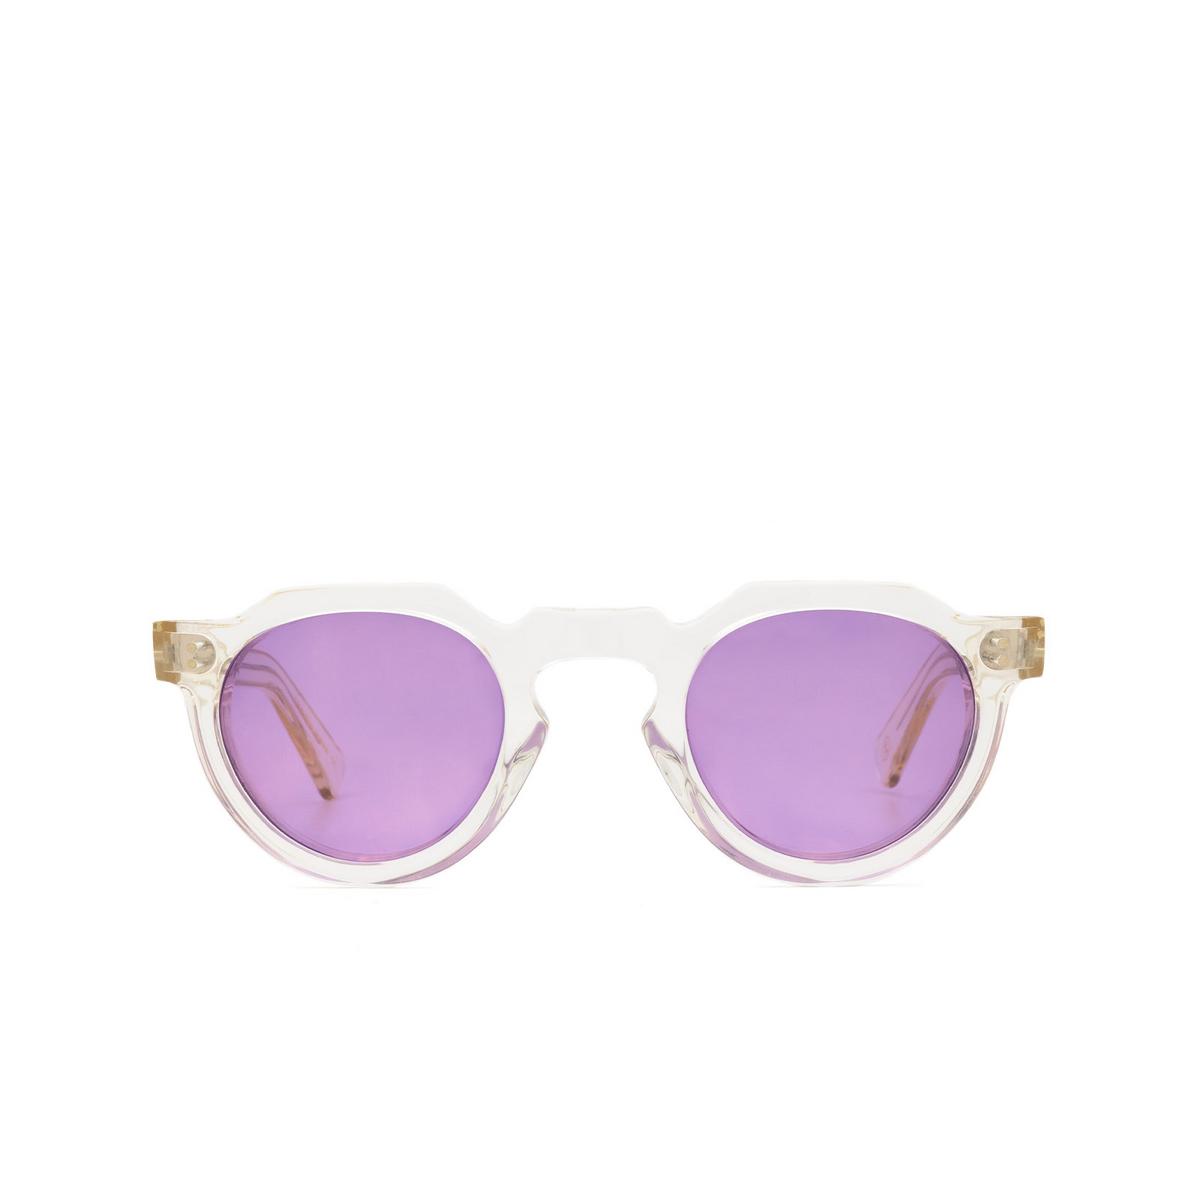 Lesca® Irregular Sunglasses: Crown Panto X Mia Burton color 21 - BRAVE PURPLE - front view.